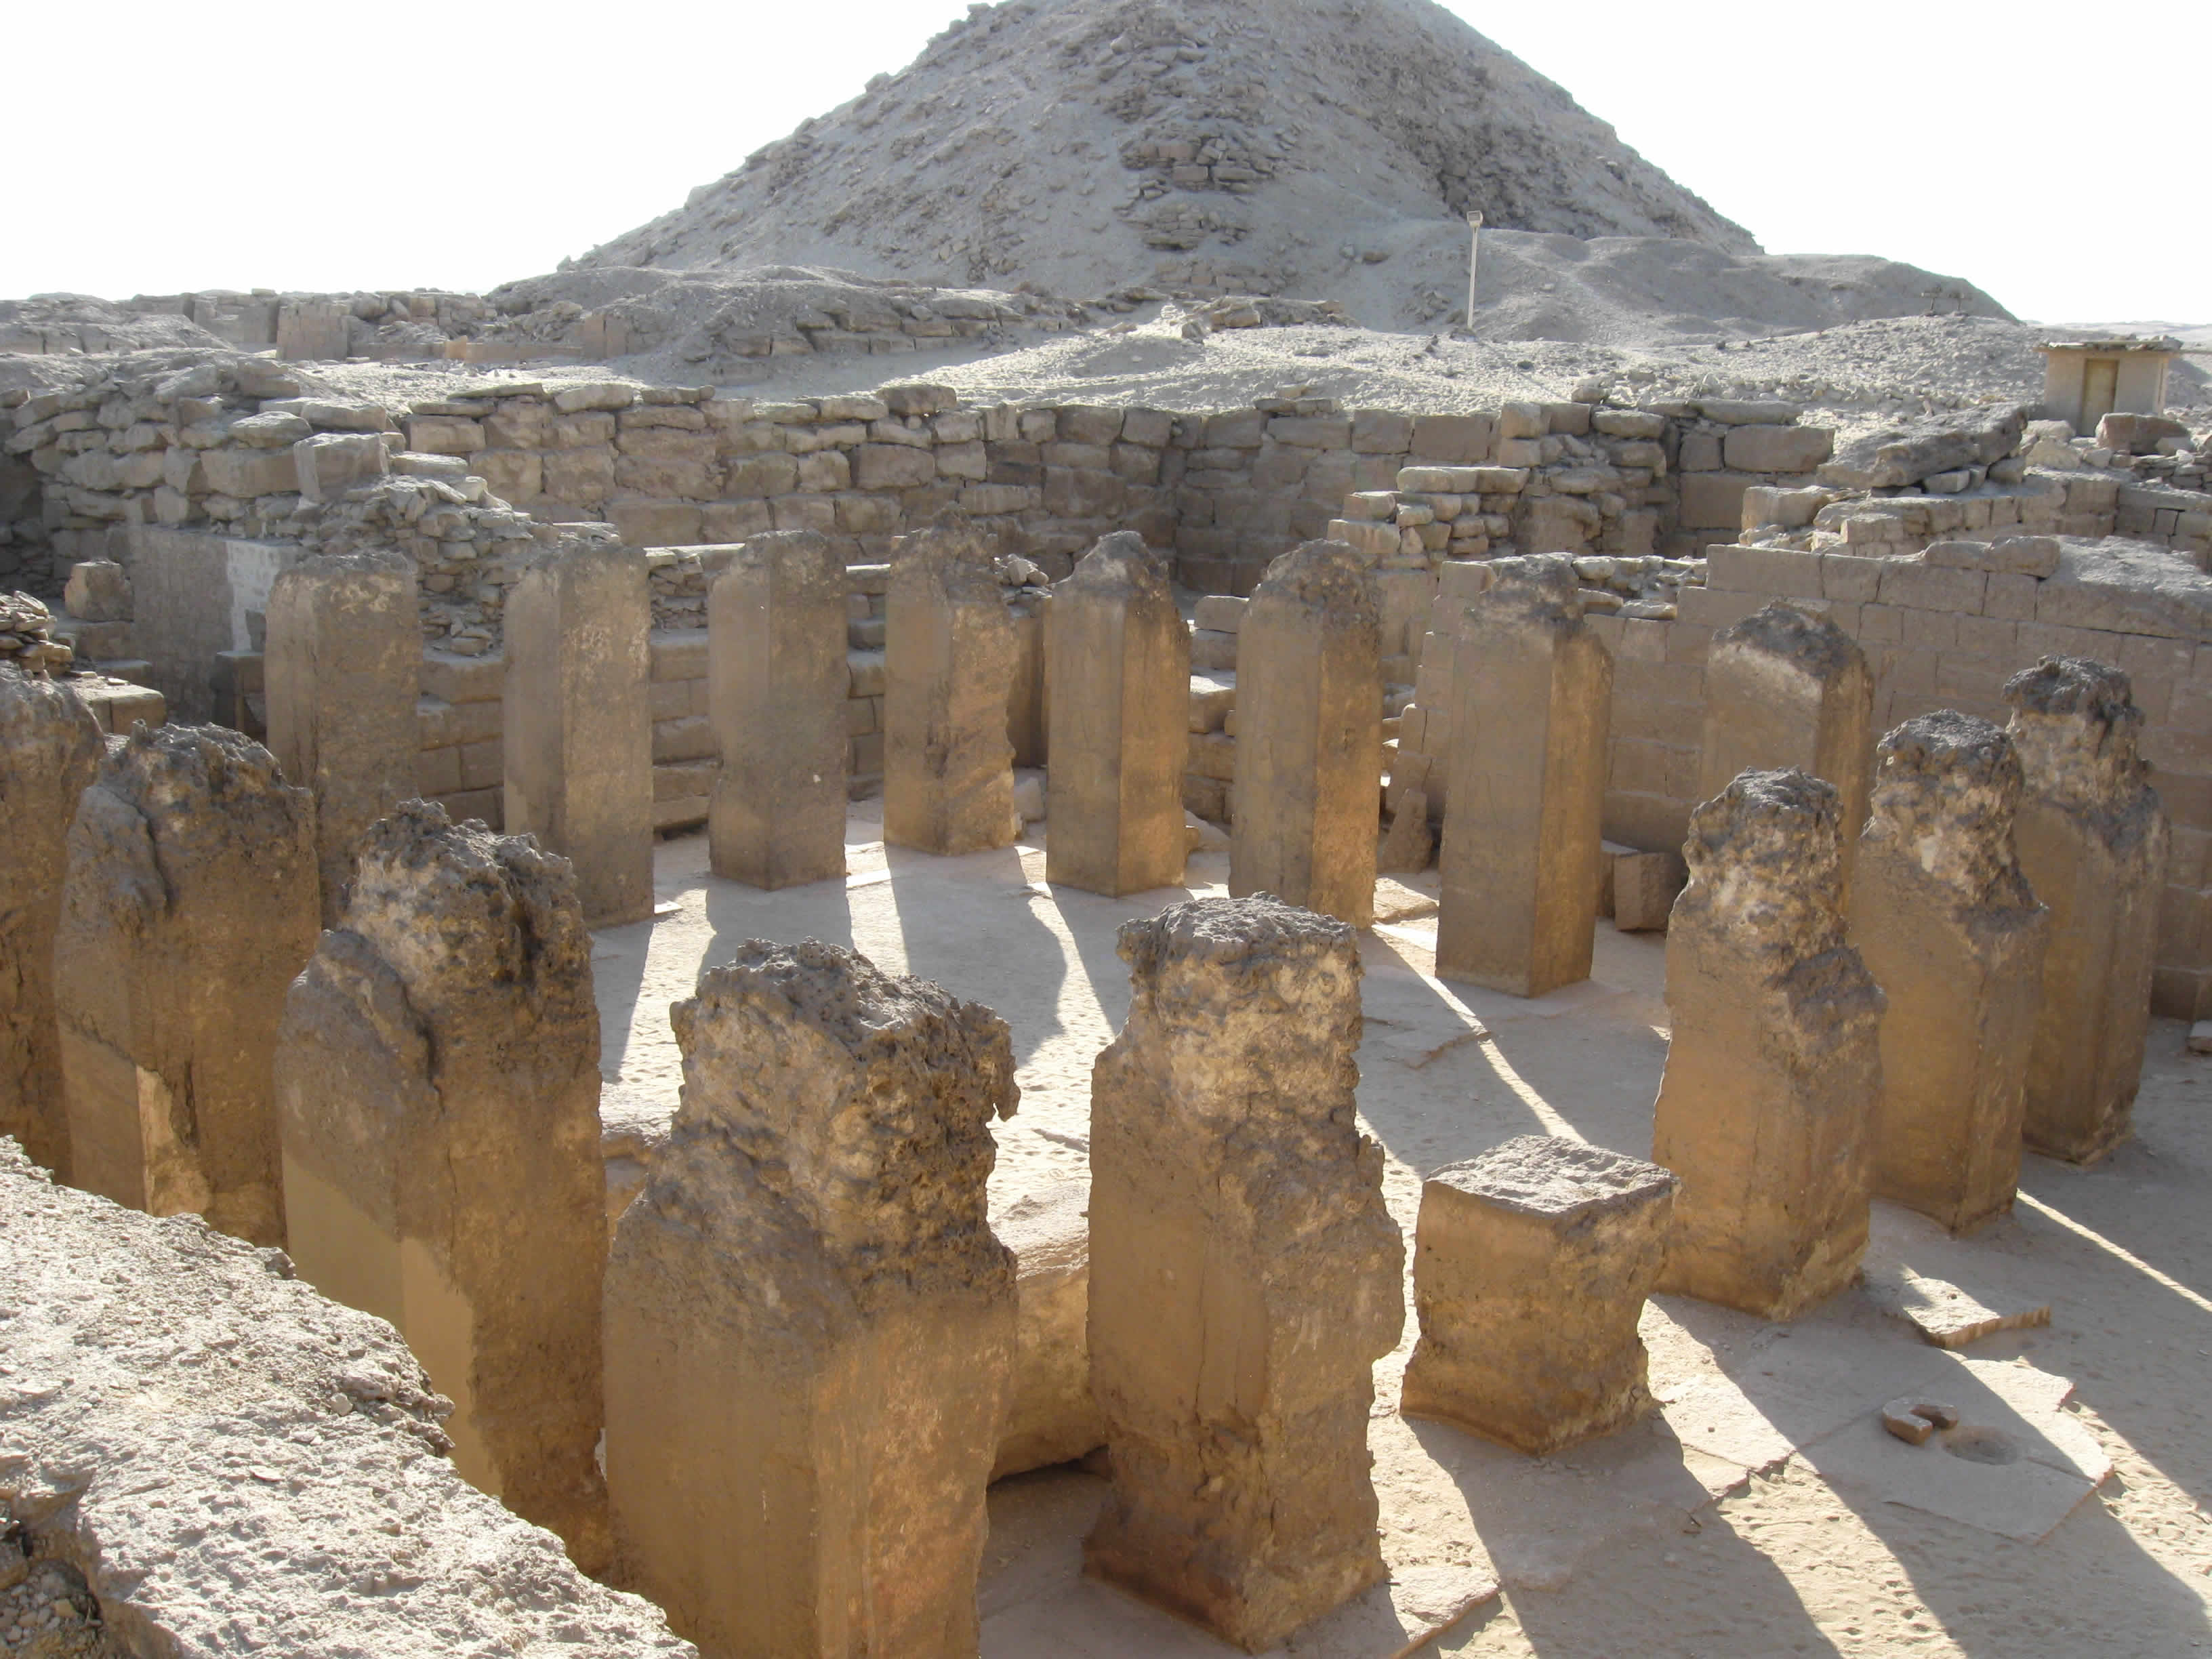 Pillared Courtyard in Mastaba of Ptahshepses